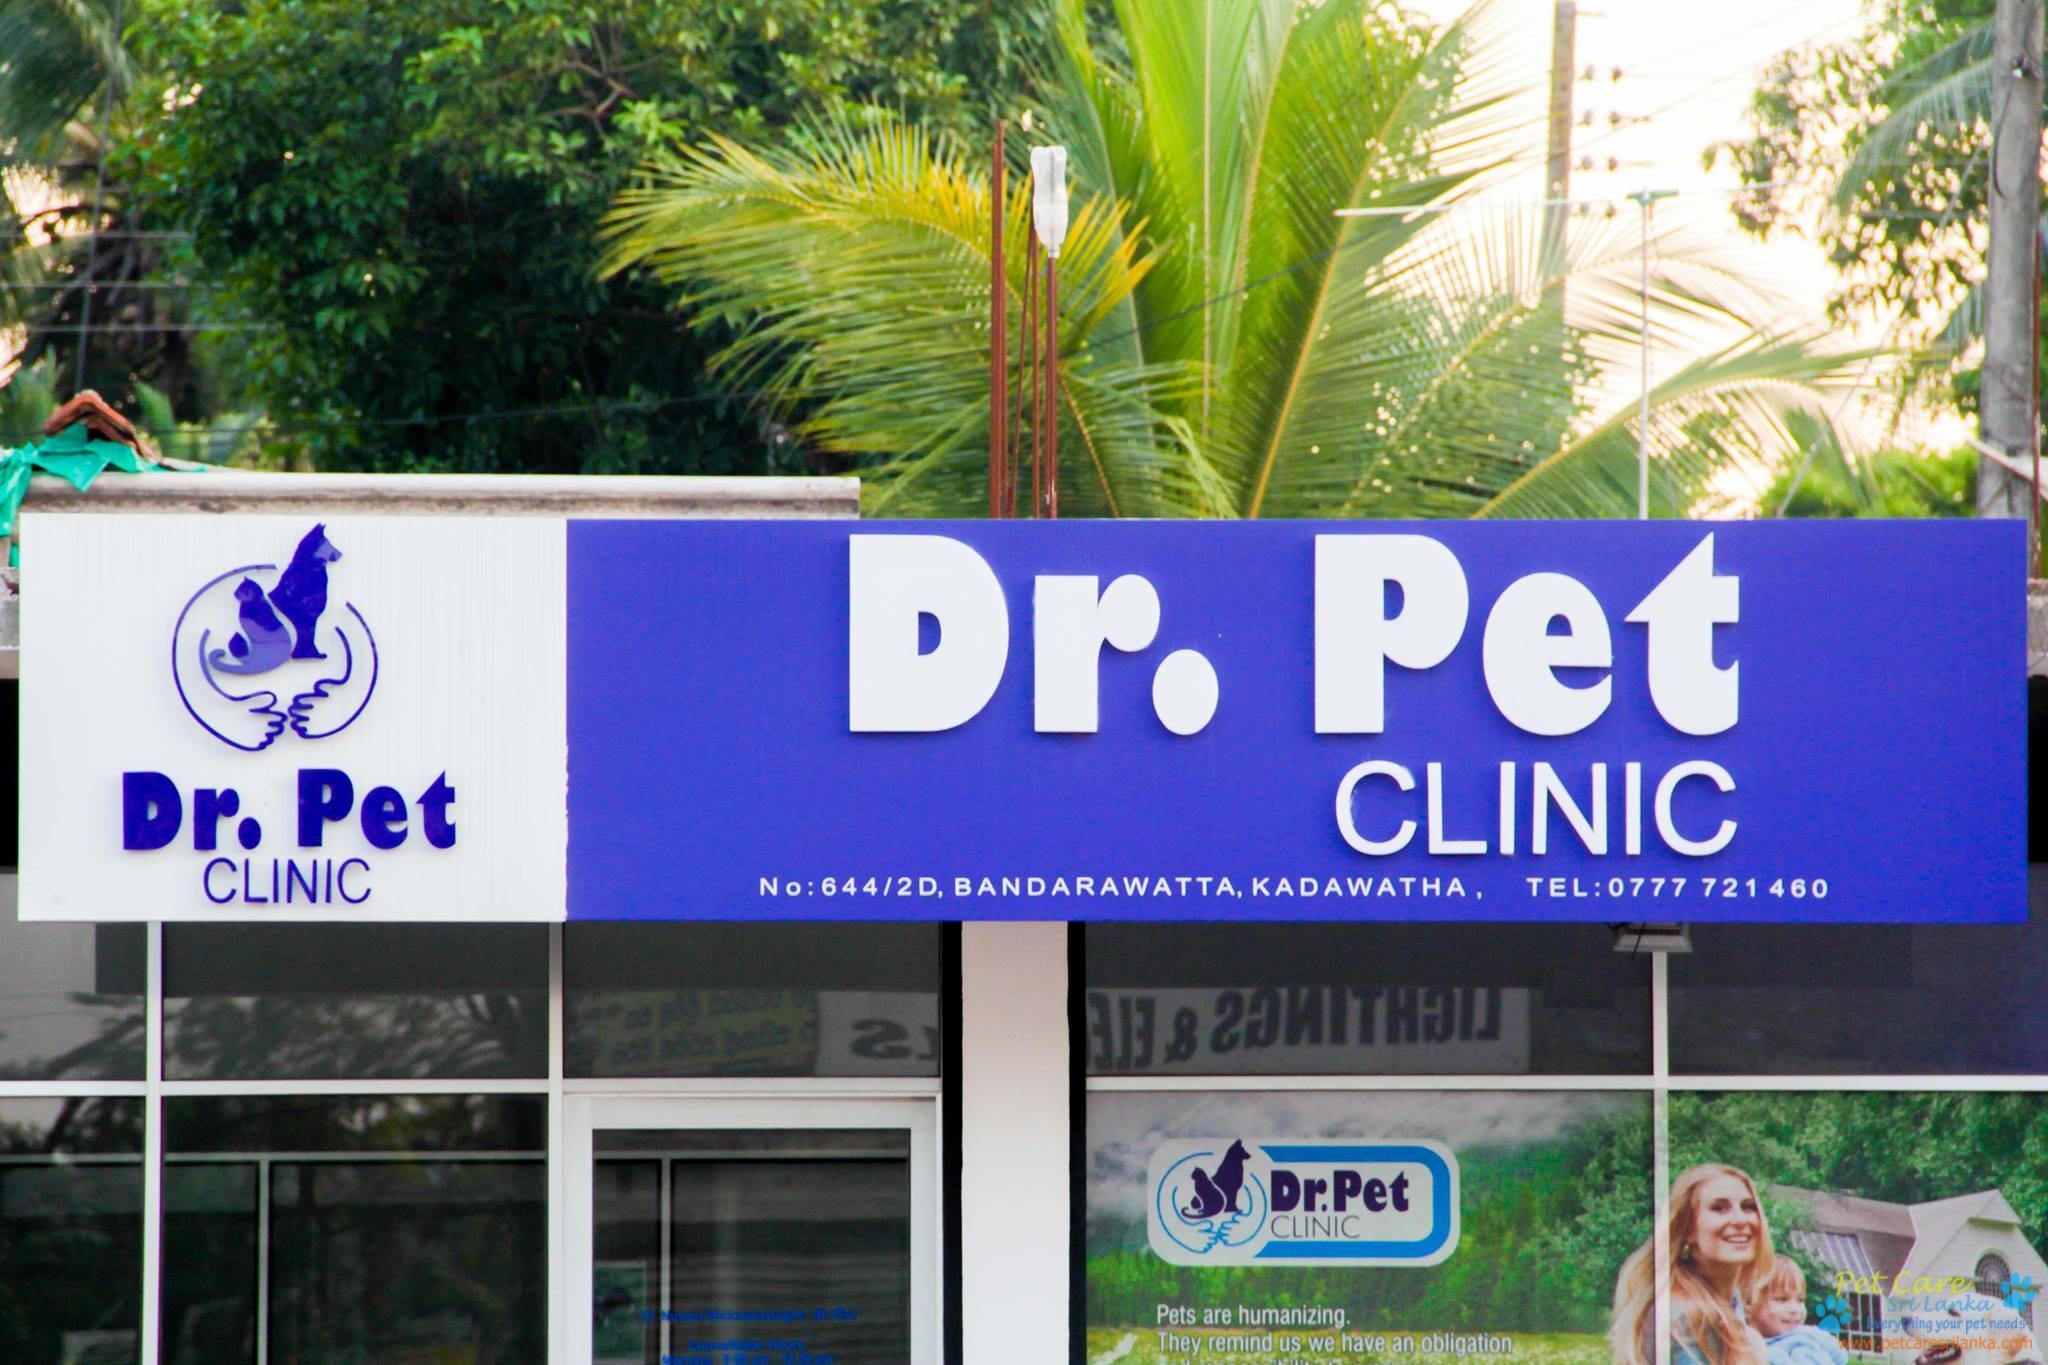 Dr. Pet Clinic - Kadawatha.jpg